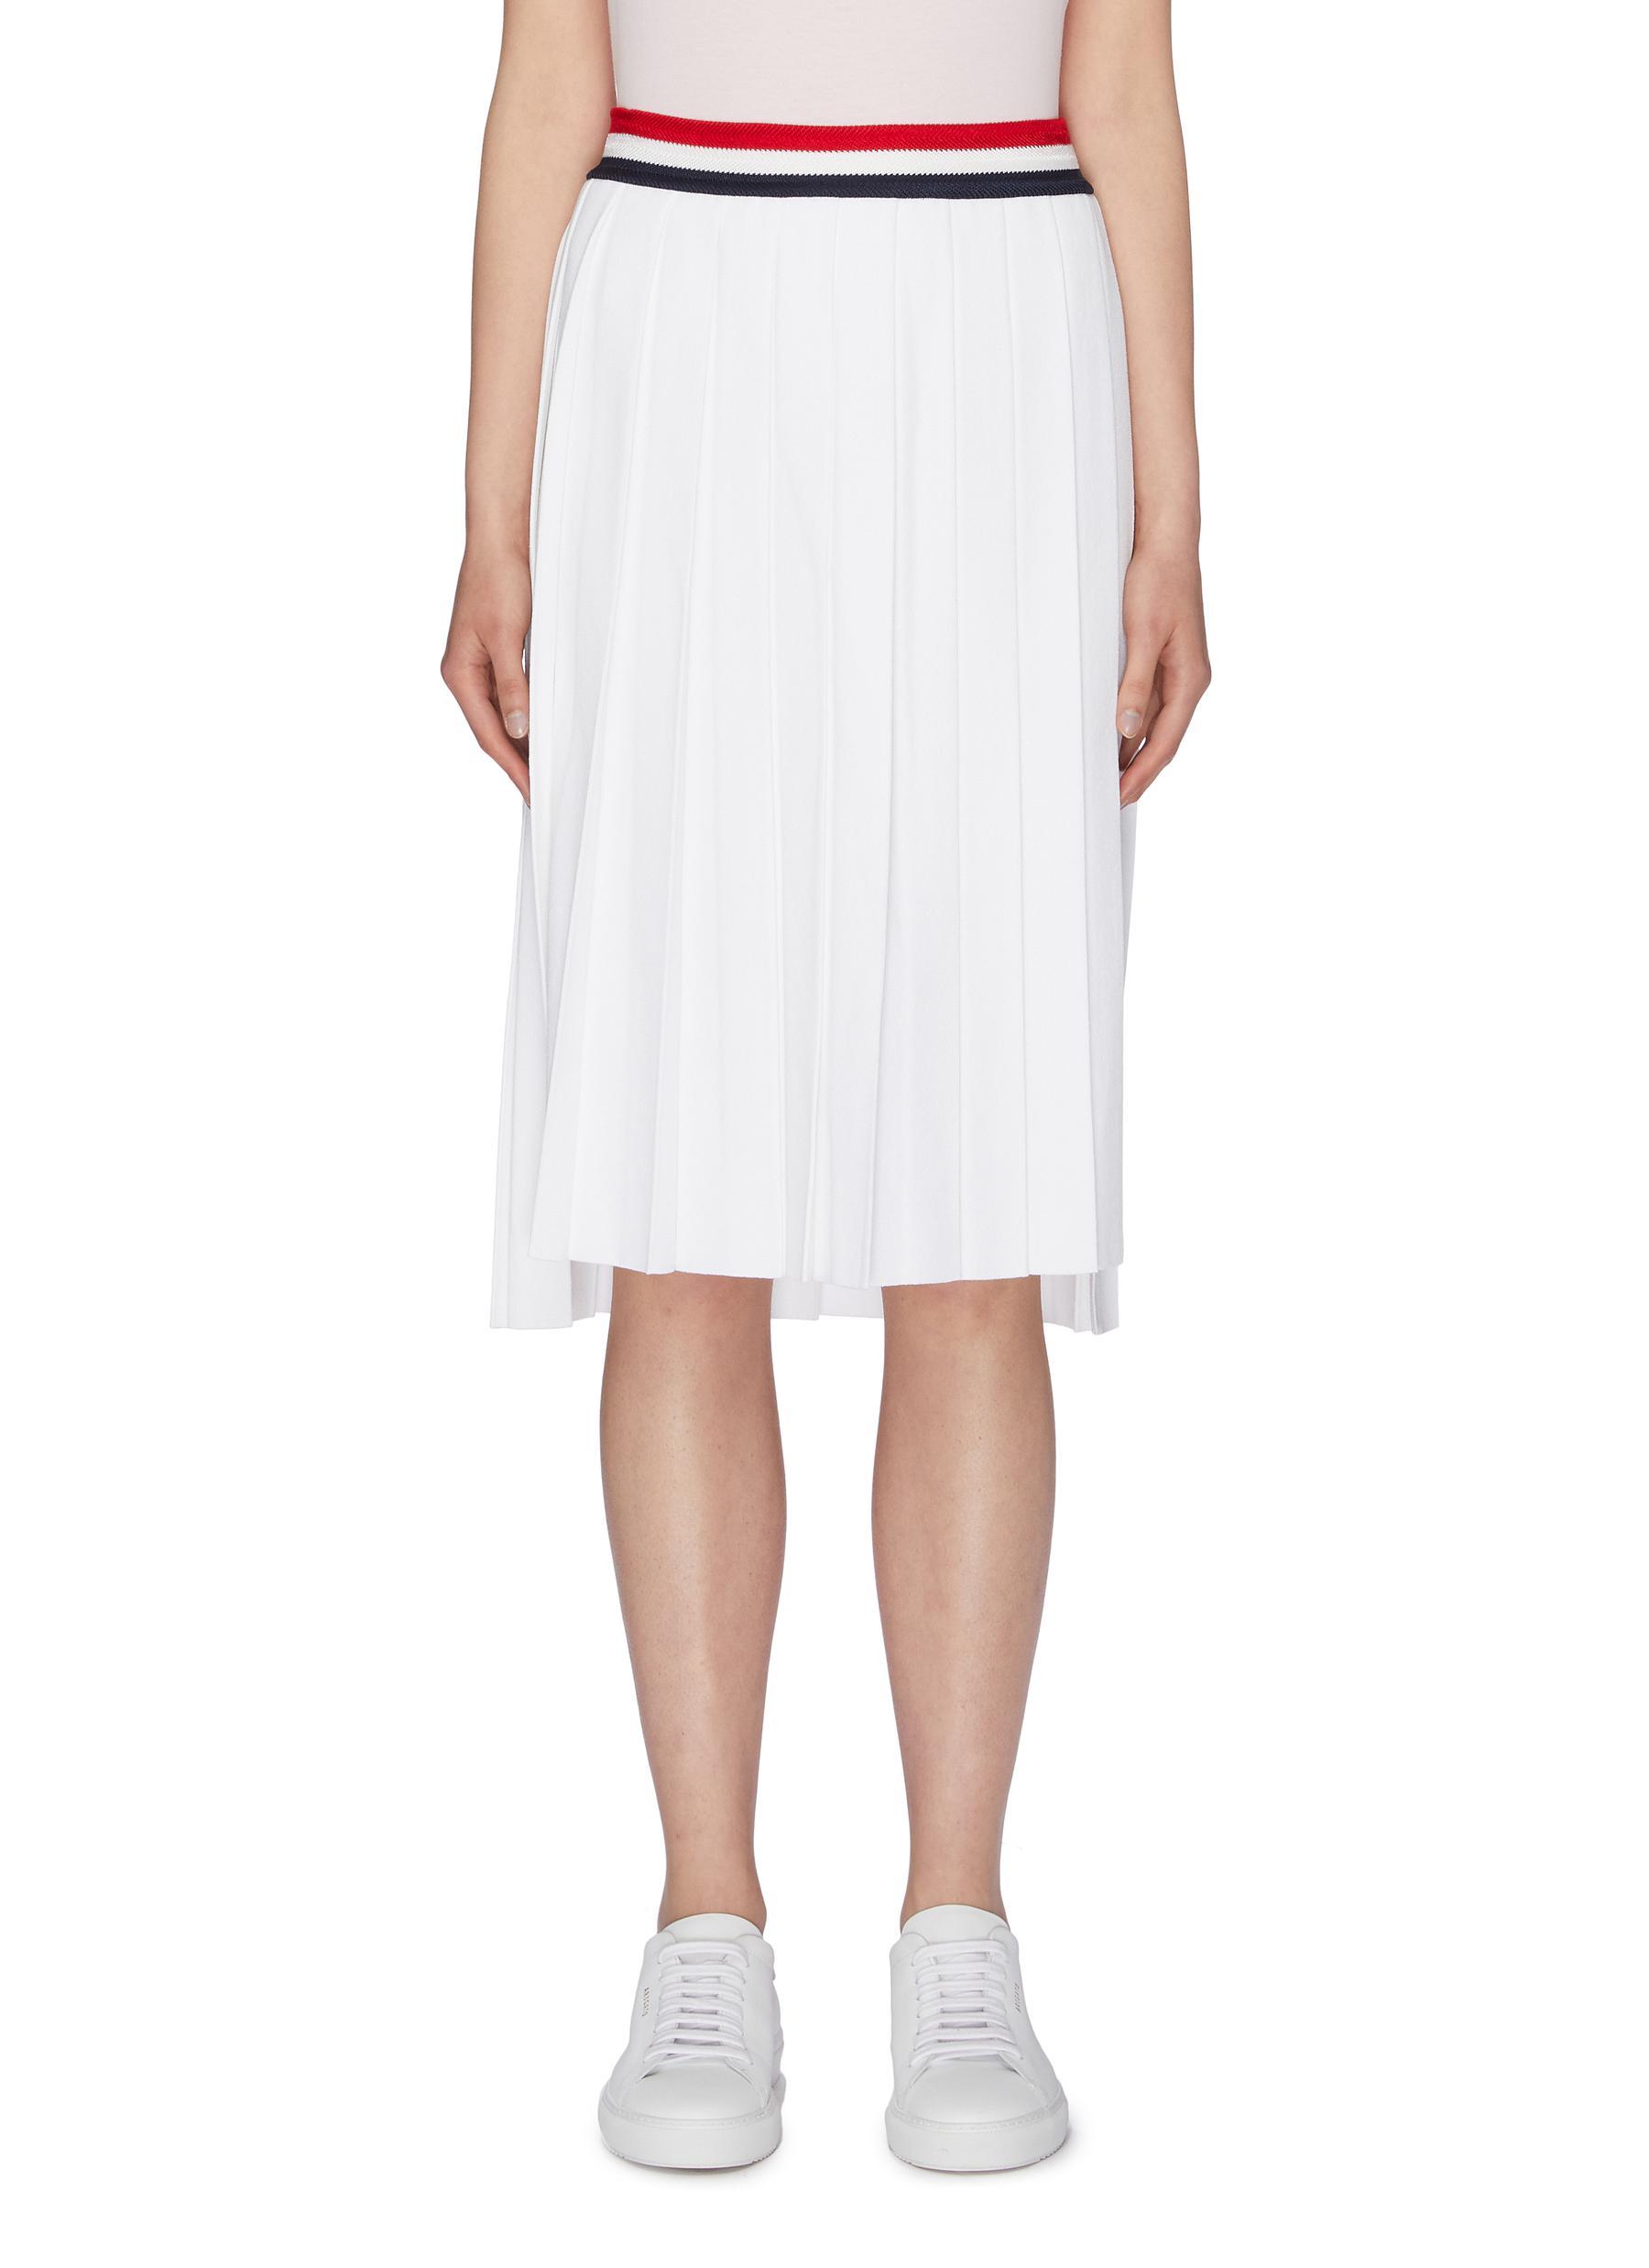 Stripe waist pleated skirt by Thom Browne